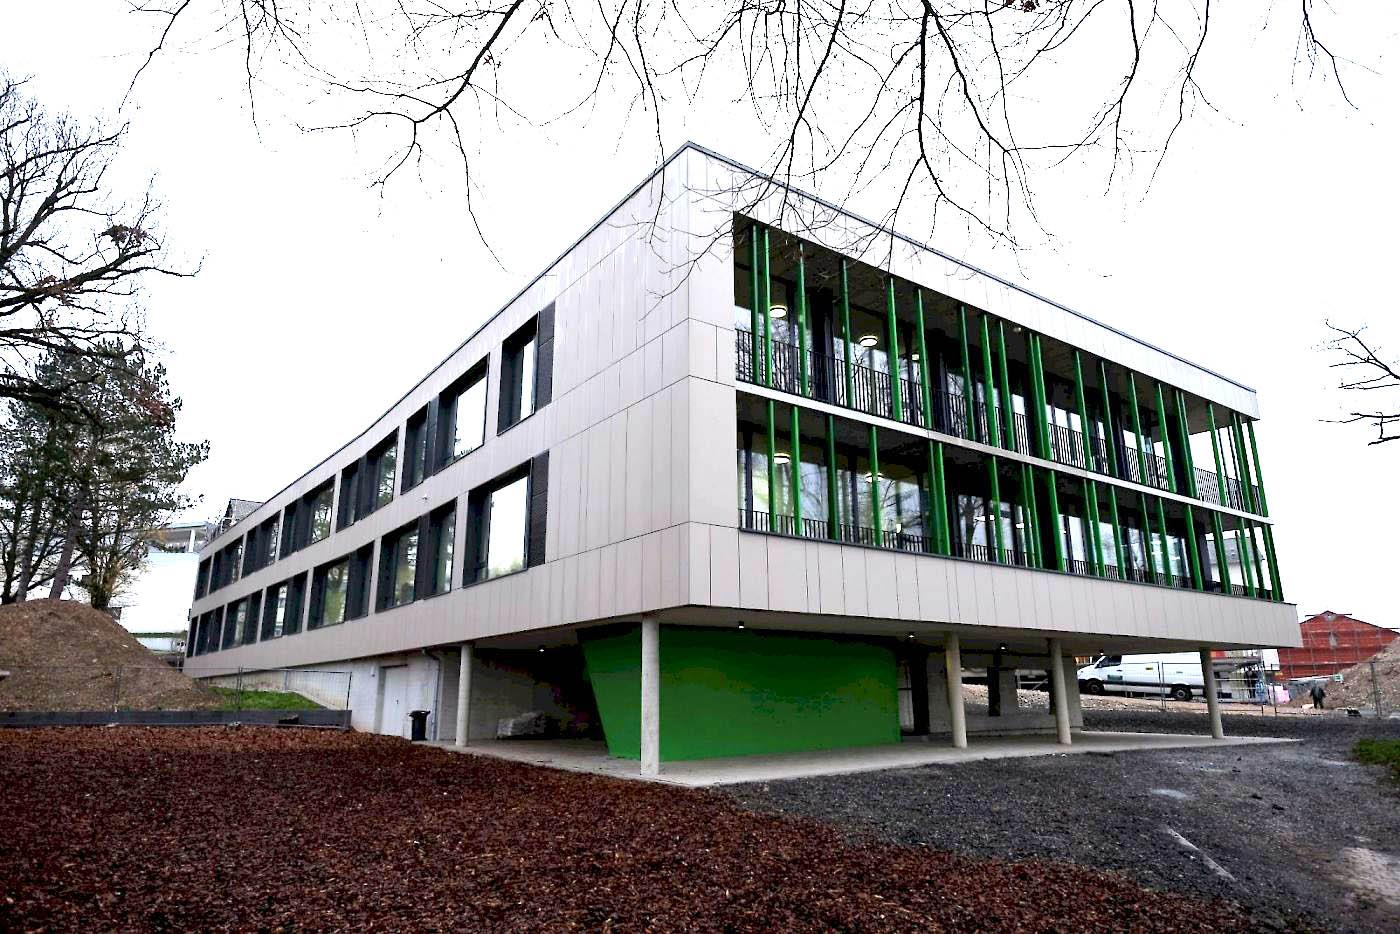 ww_Bildung_Gesamtschule_Melsungen_4c_1400x0_2